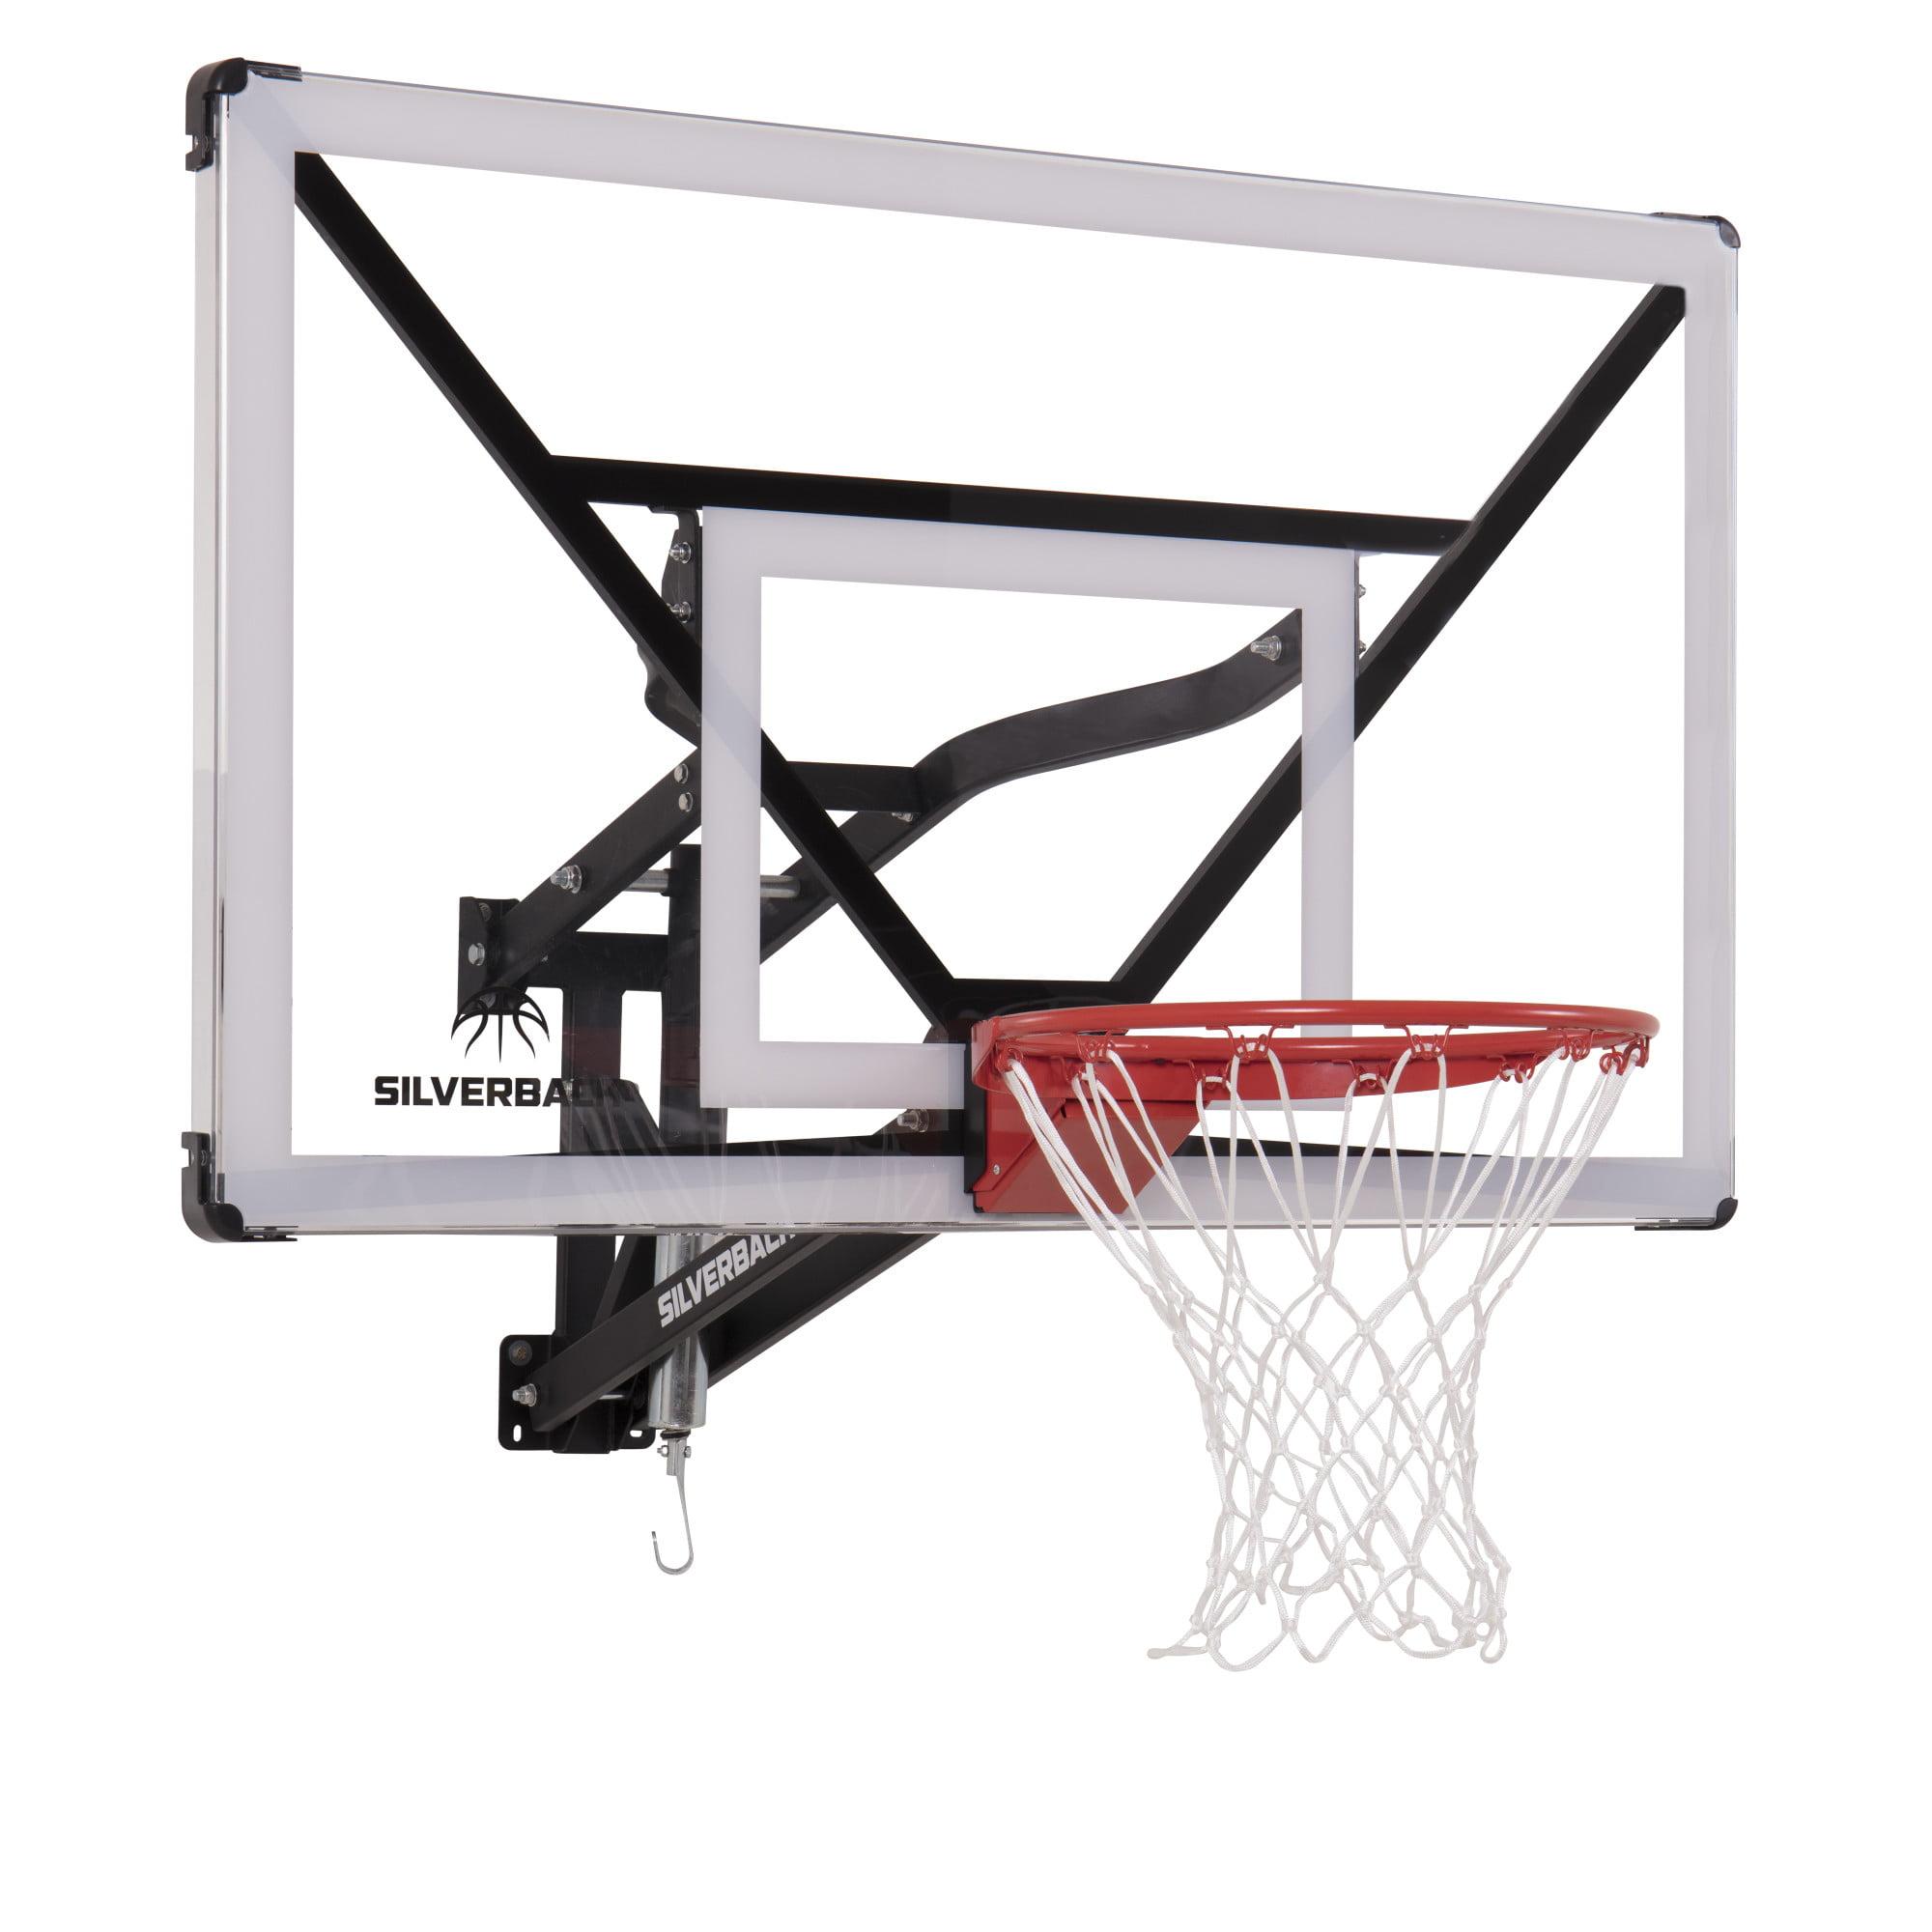 "Silverback NXT 54"" Wall Mounted Adjustable Basketball Hoop"